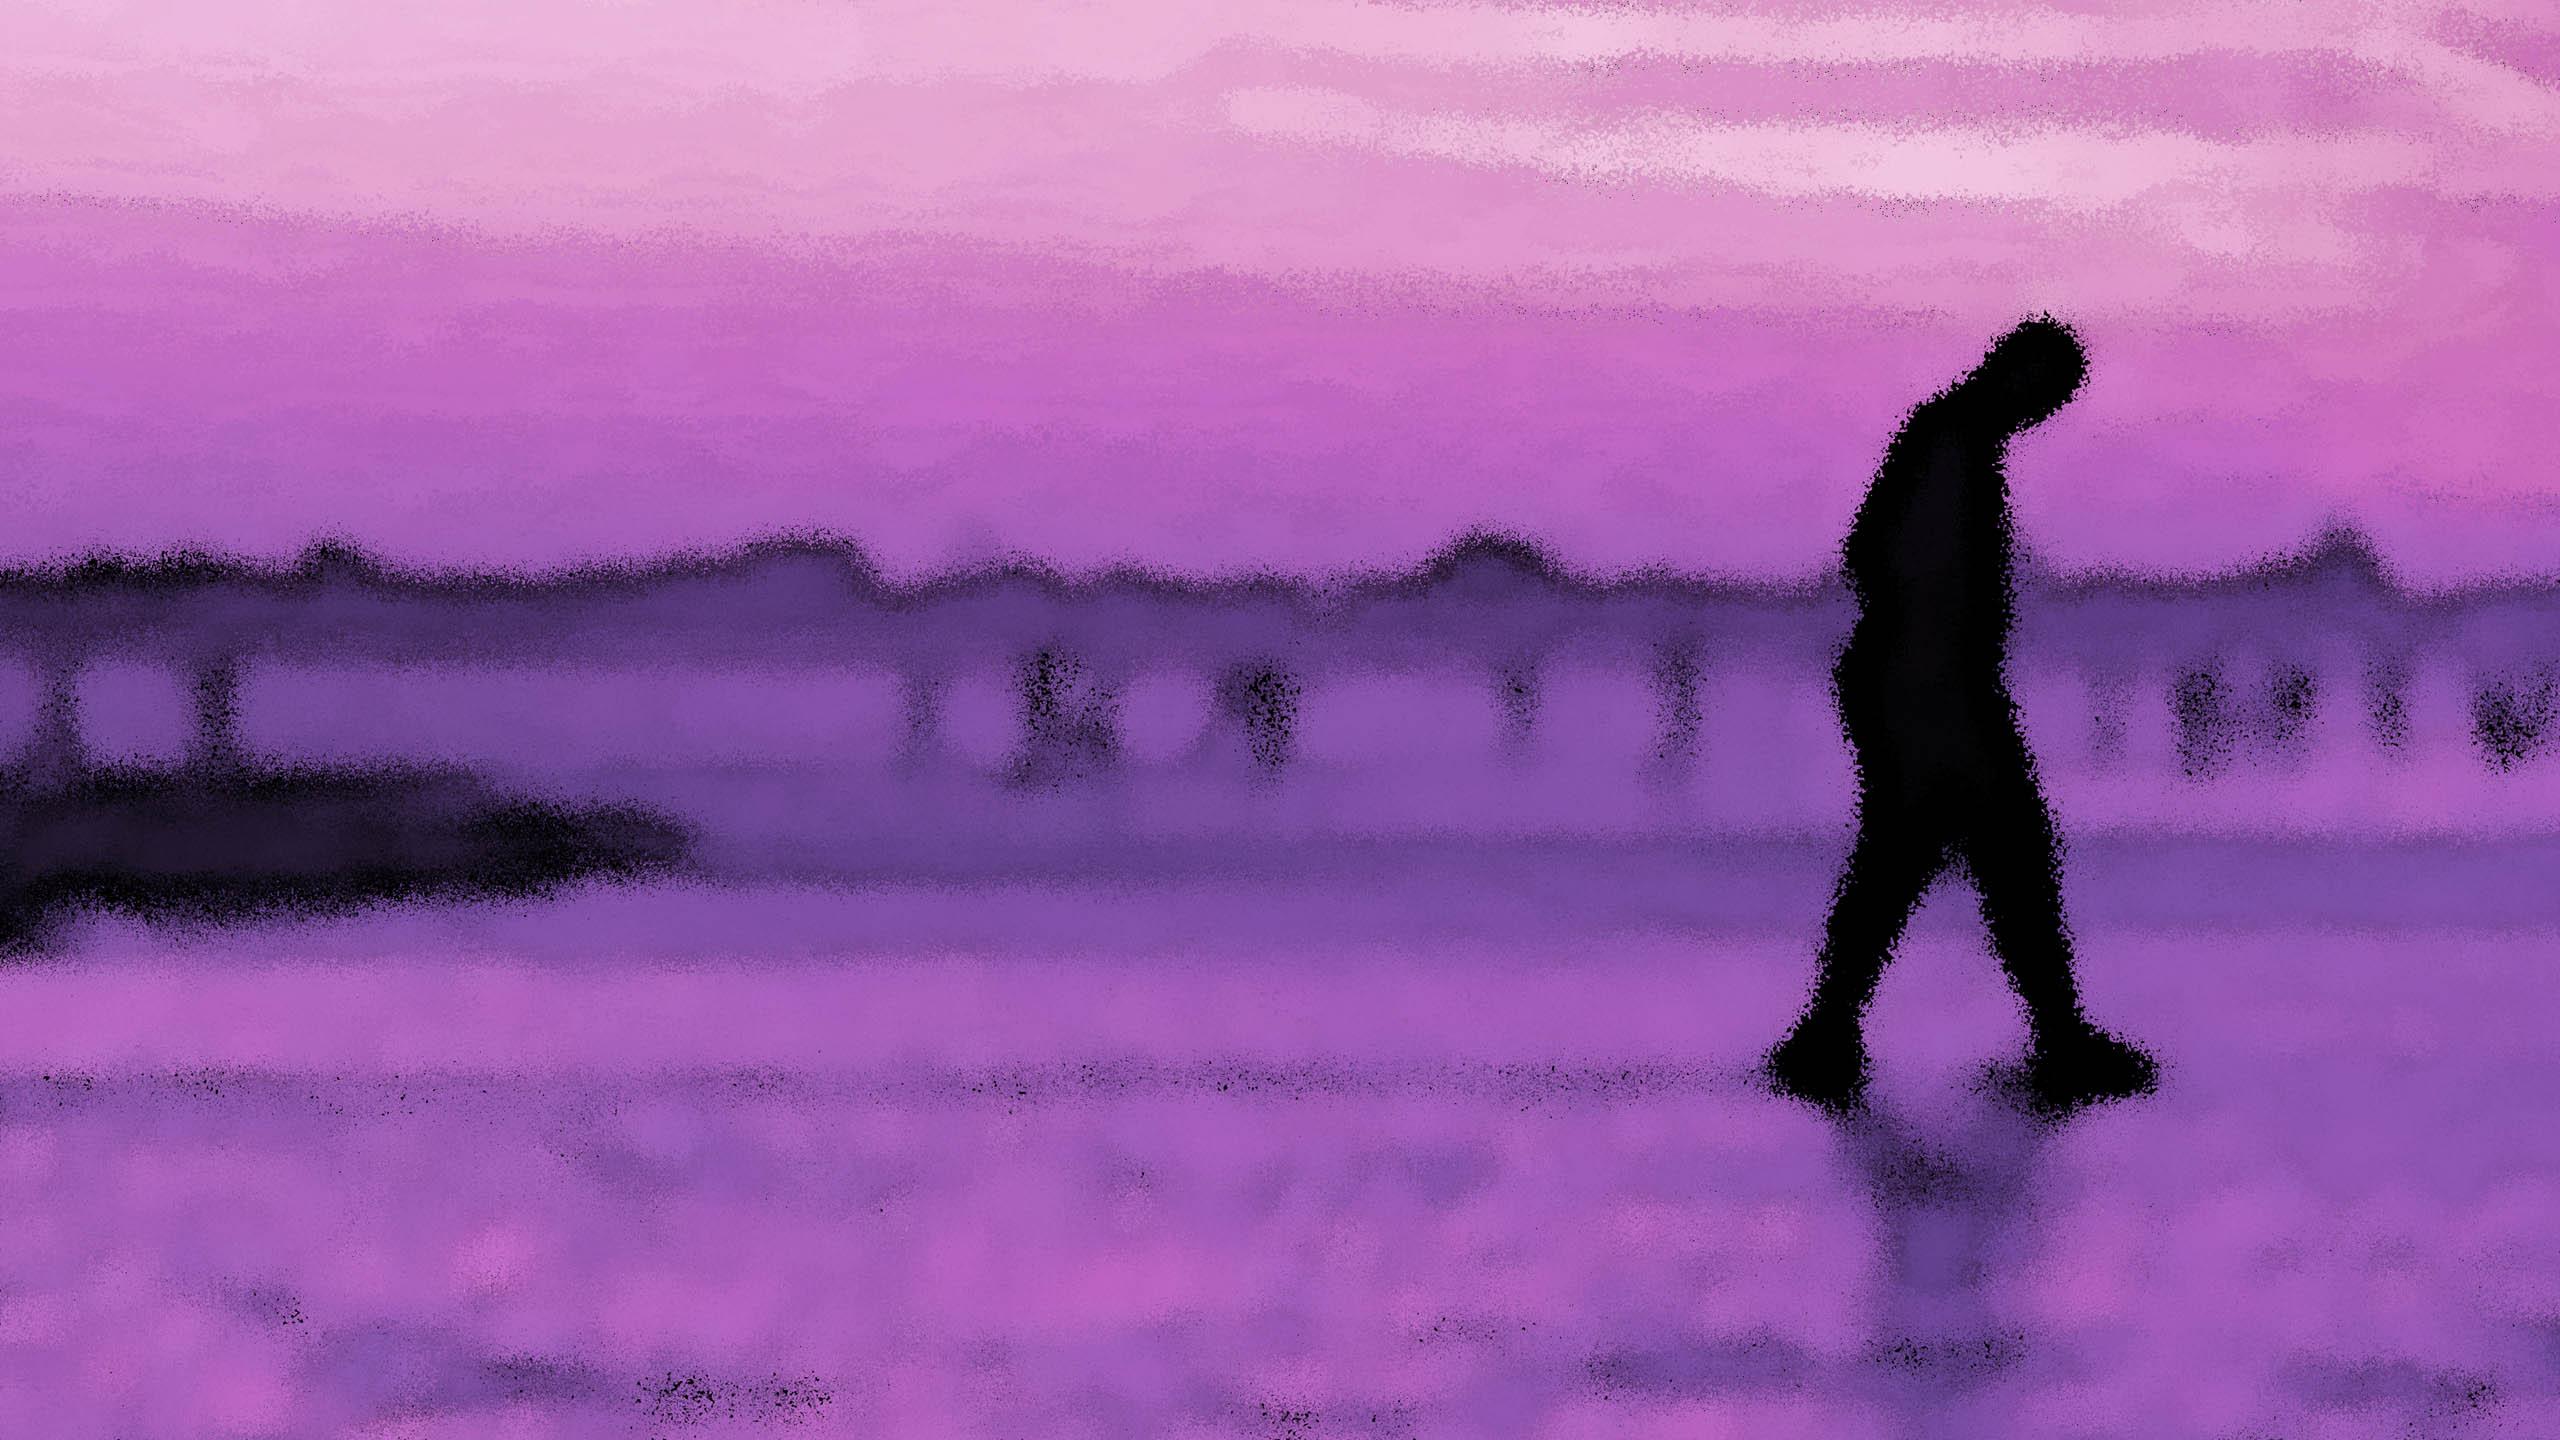 Bour Siien paseando / Kopi Luwak